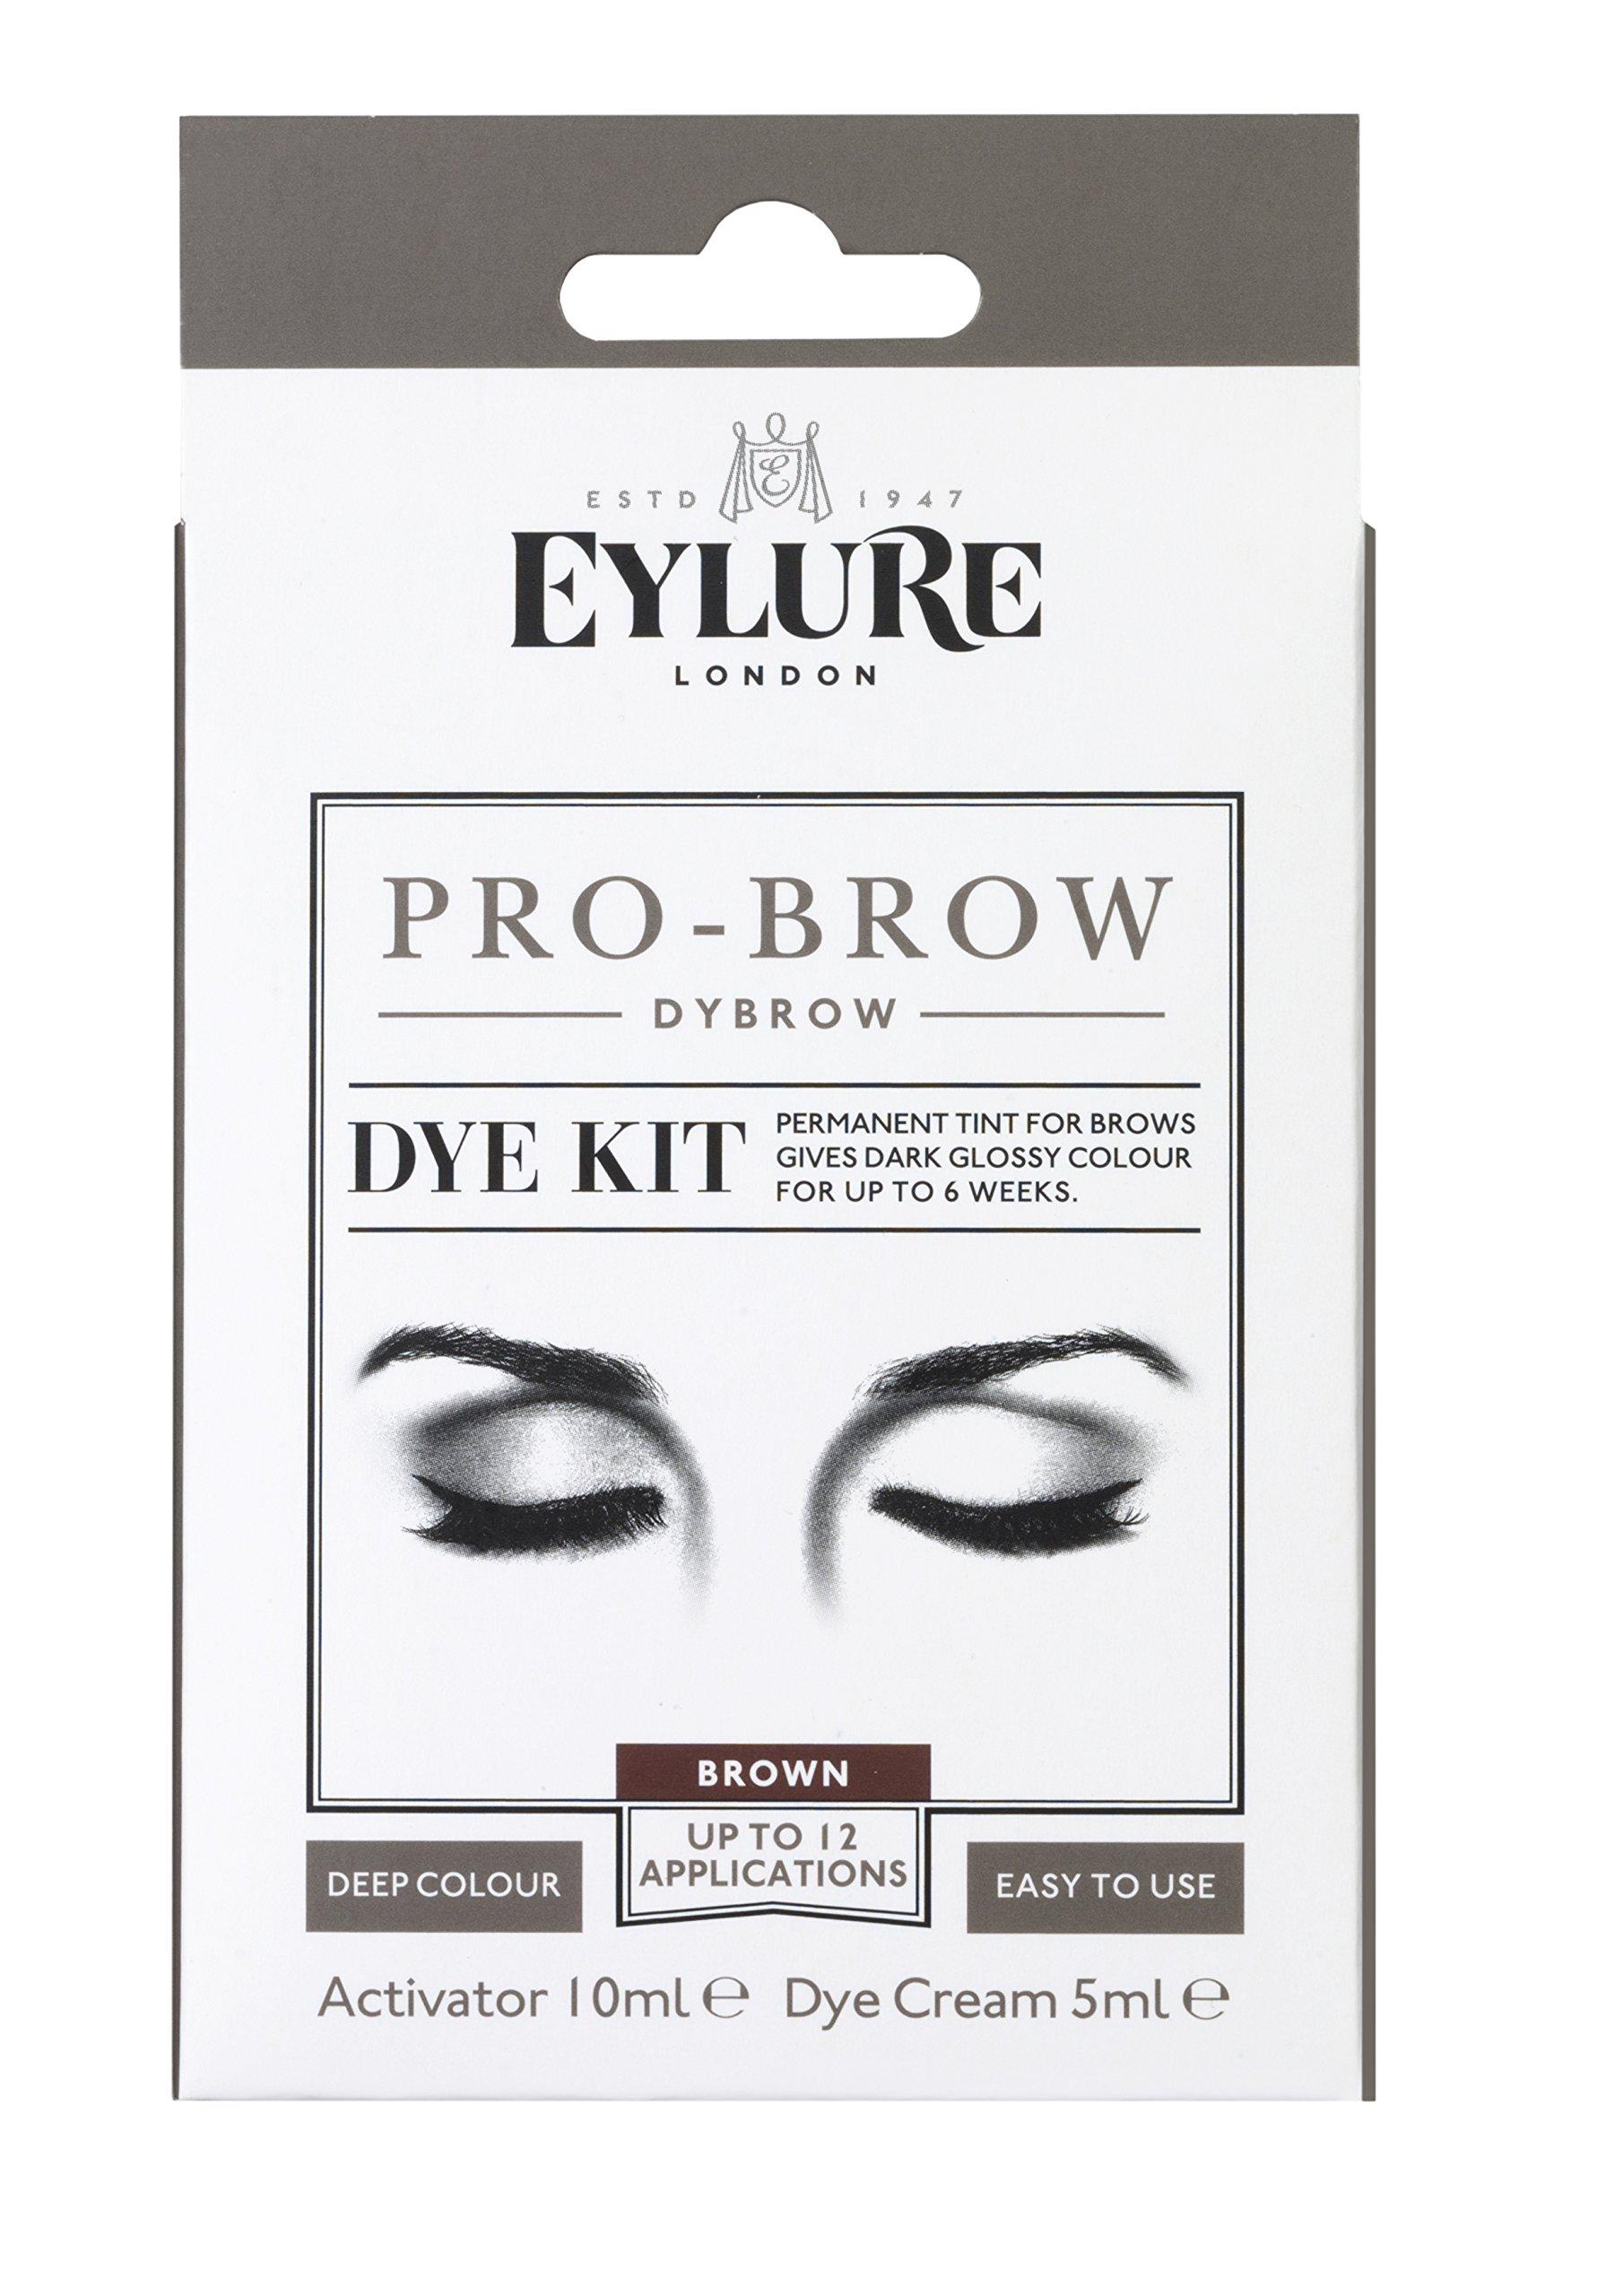 Fixbub Eylure Dybrow 45 Day - Dark Brown